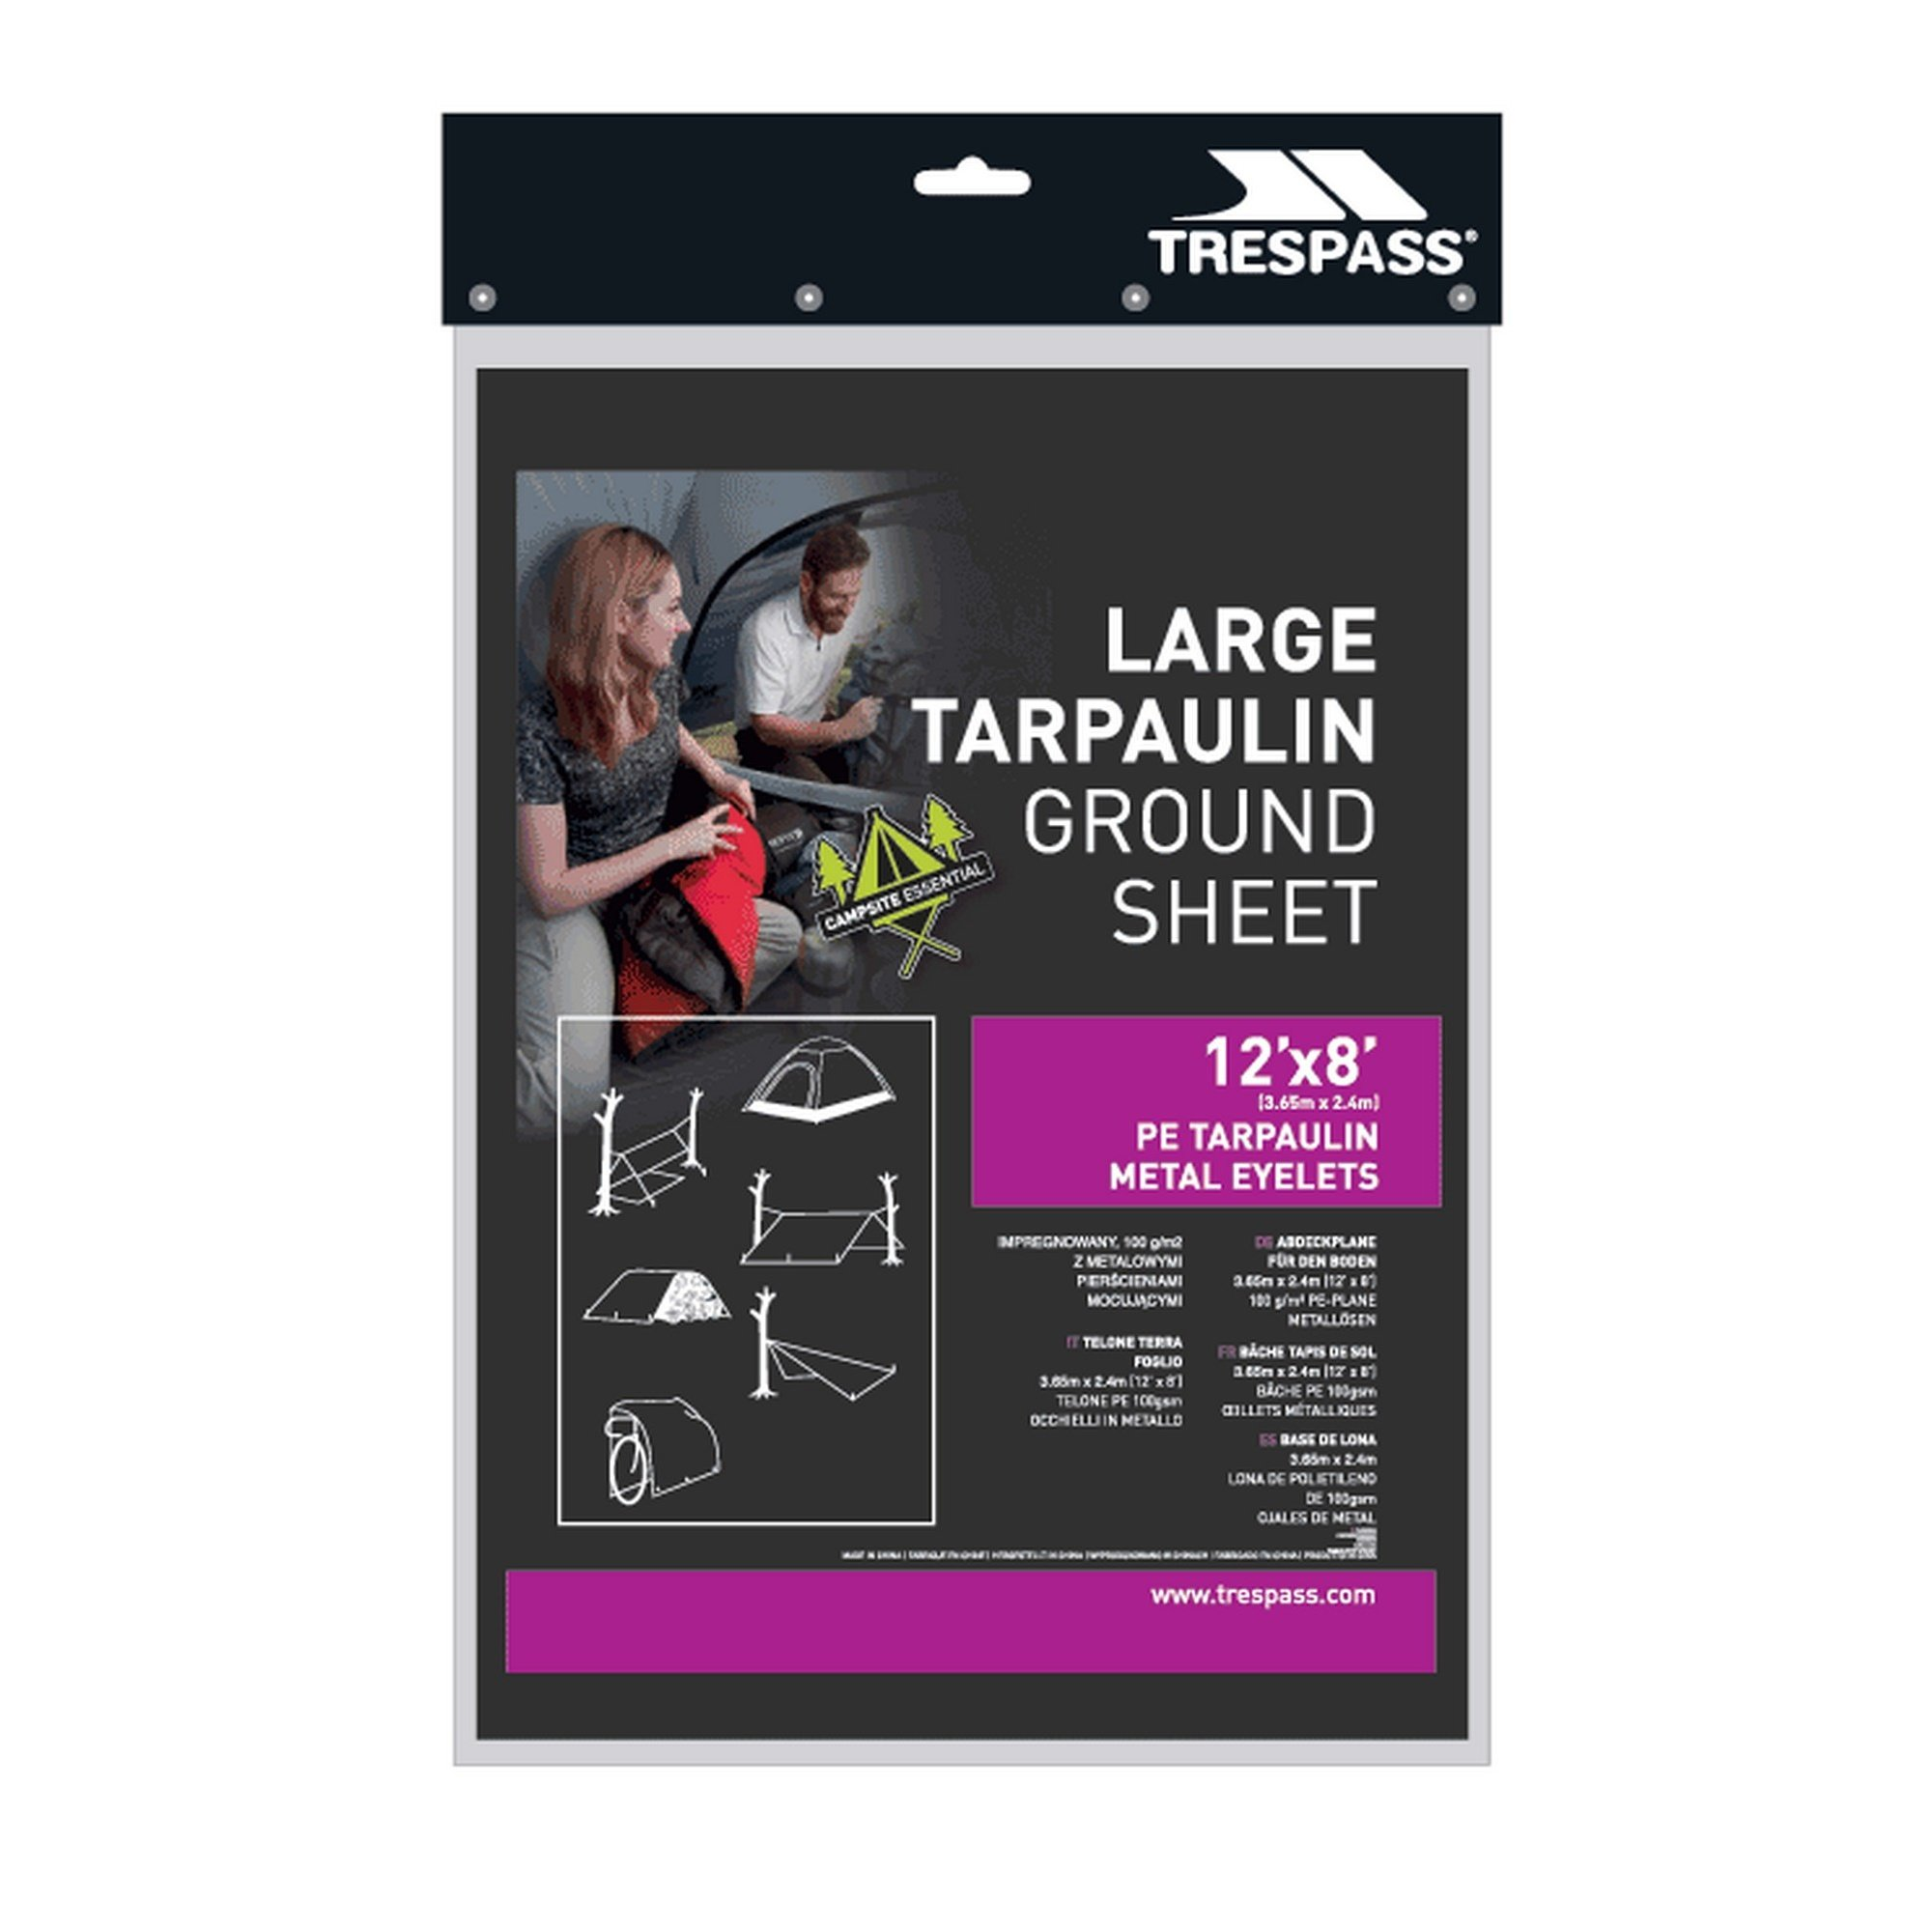 Trespass Faulken Large Tarpaulin Ground Sheet (One Size) (Black) by Trespass